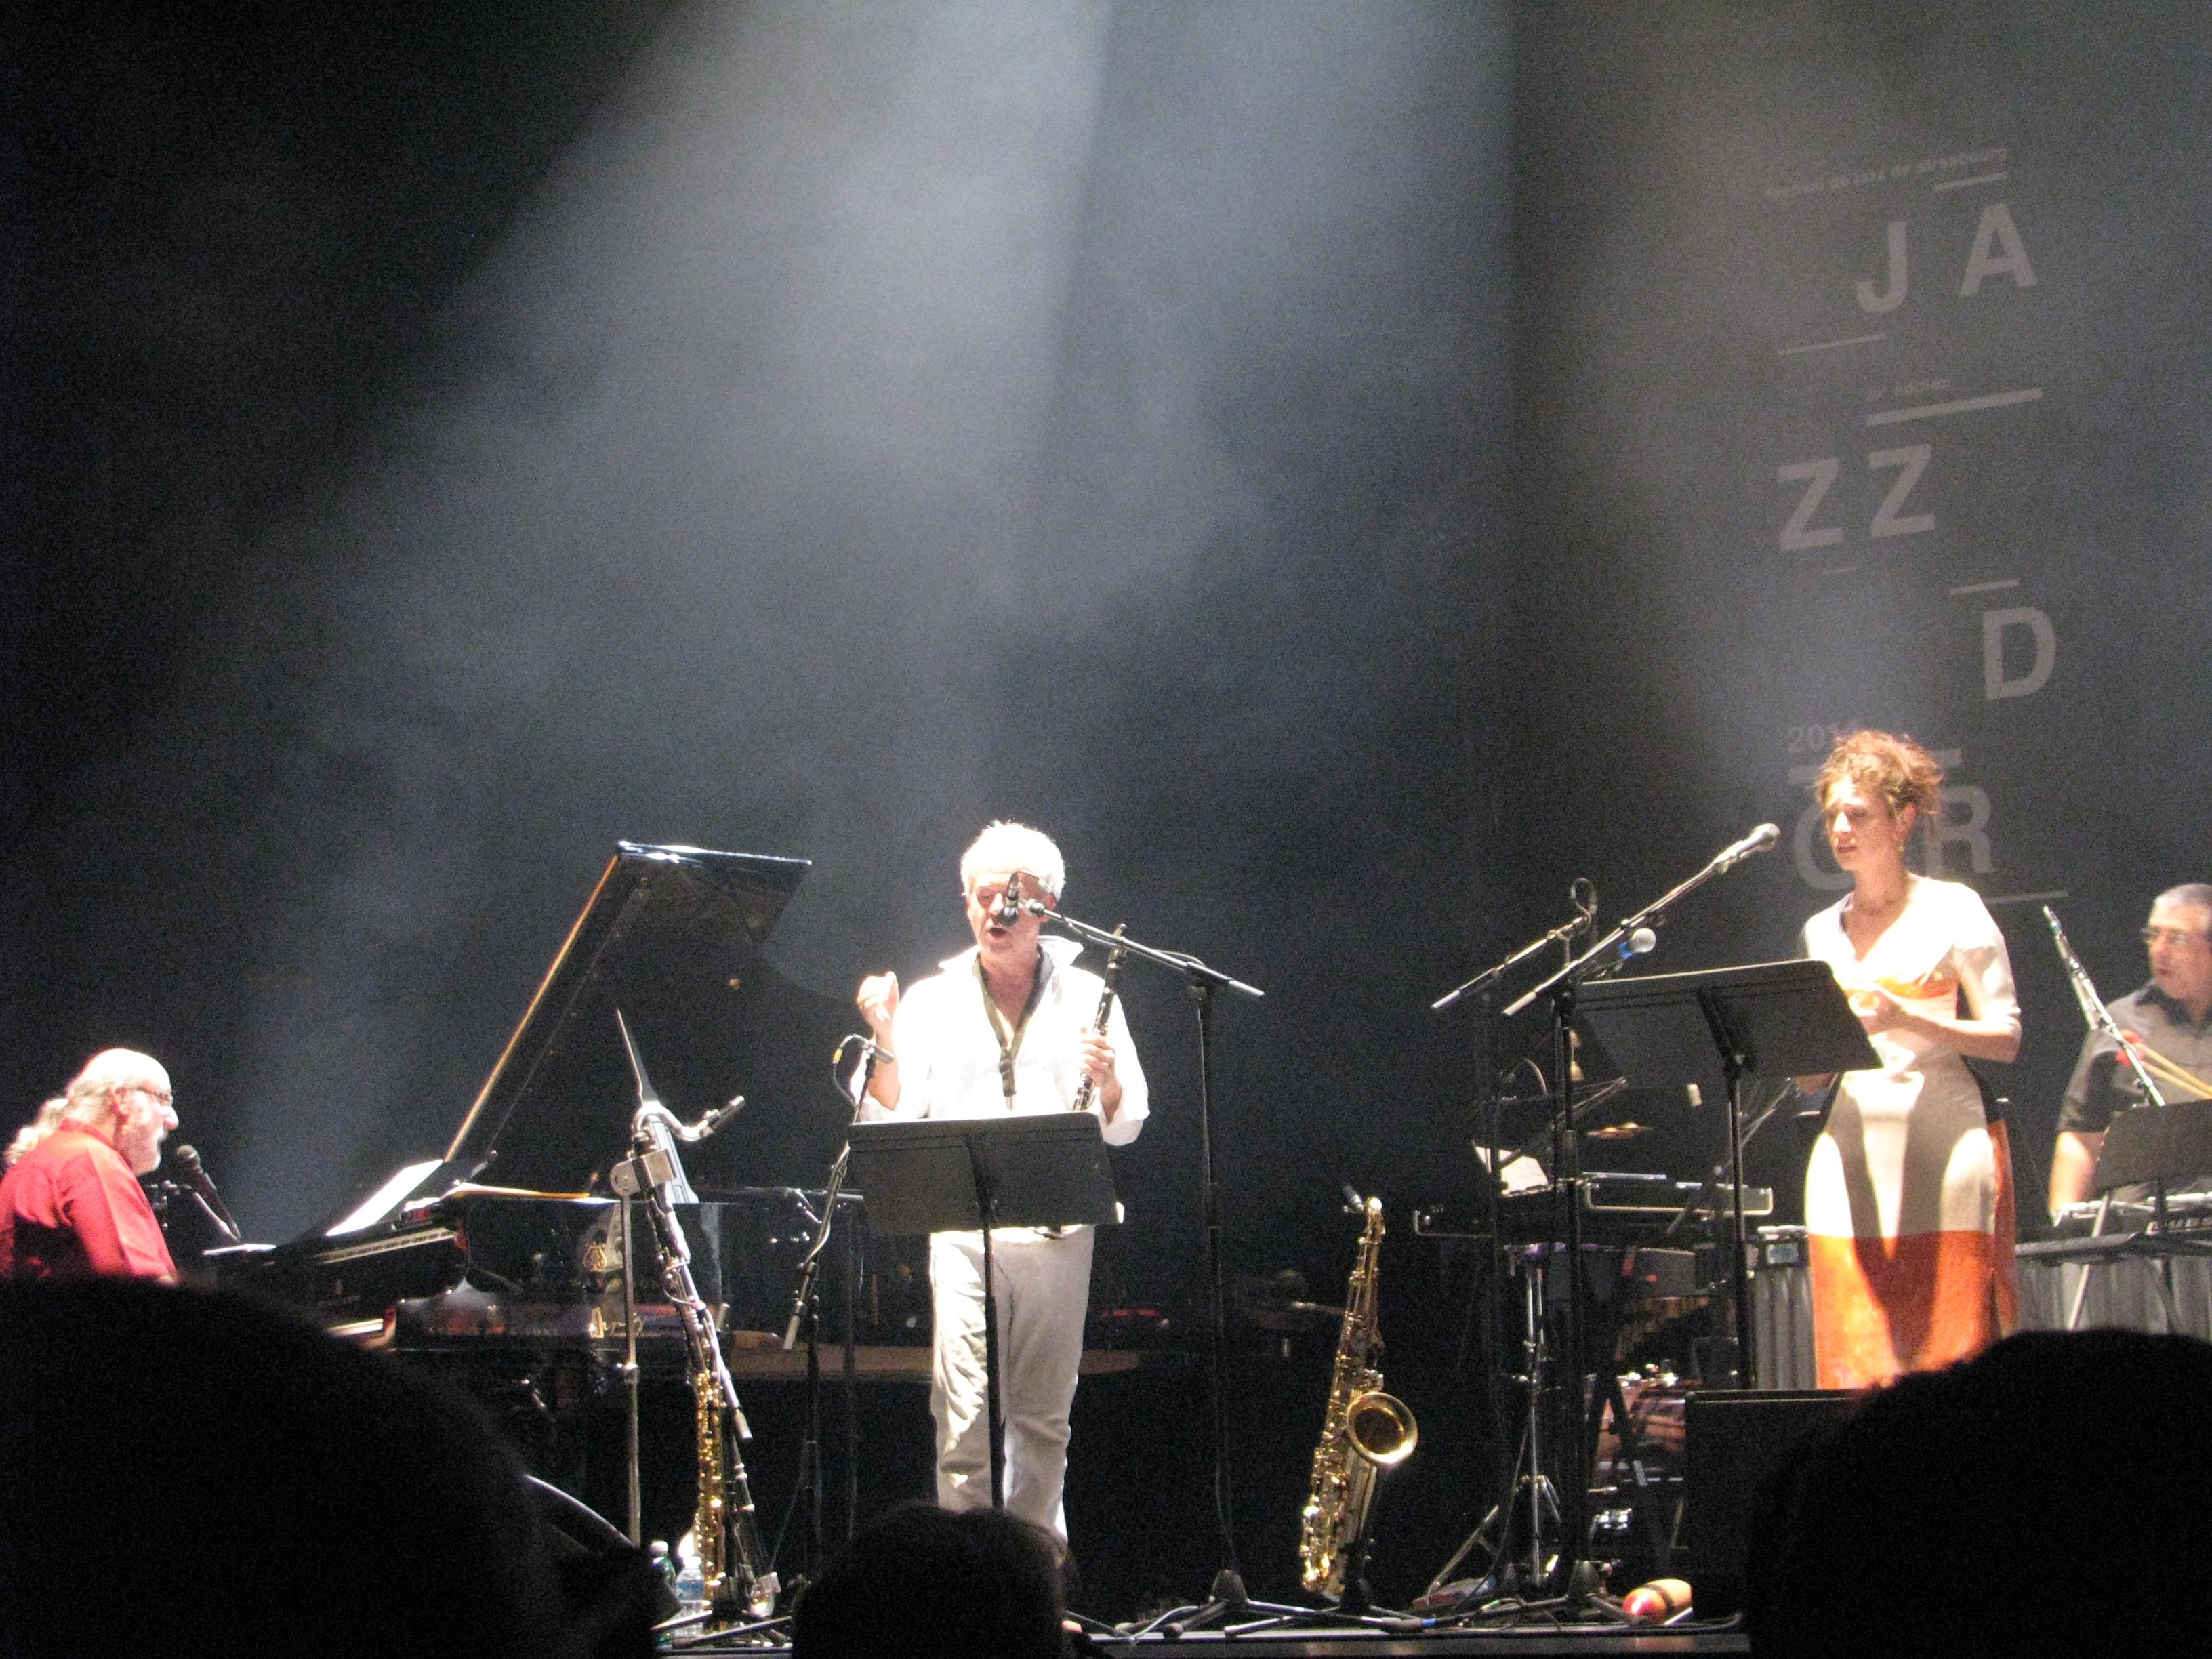 Une Petite Histoire de L'opera Jazzdor Strasbourg 2014